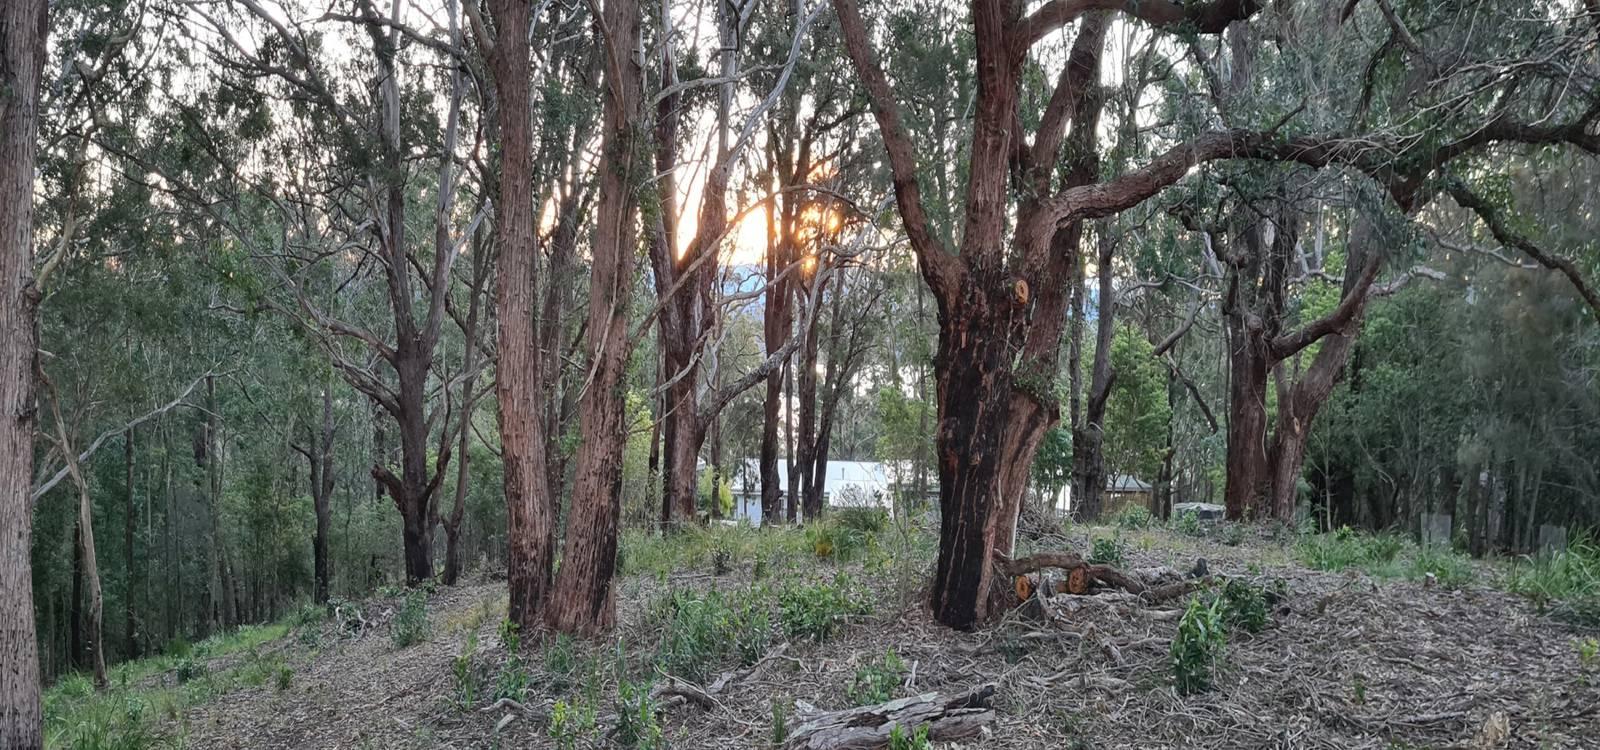 31 Hector McWilliam Drive TUROSS HEAD, NSW 2537 - photo 1